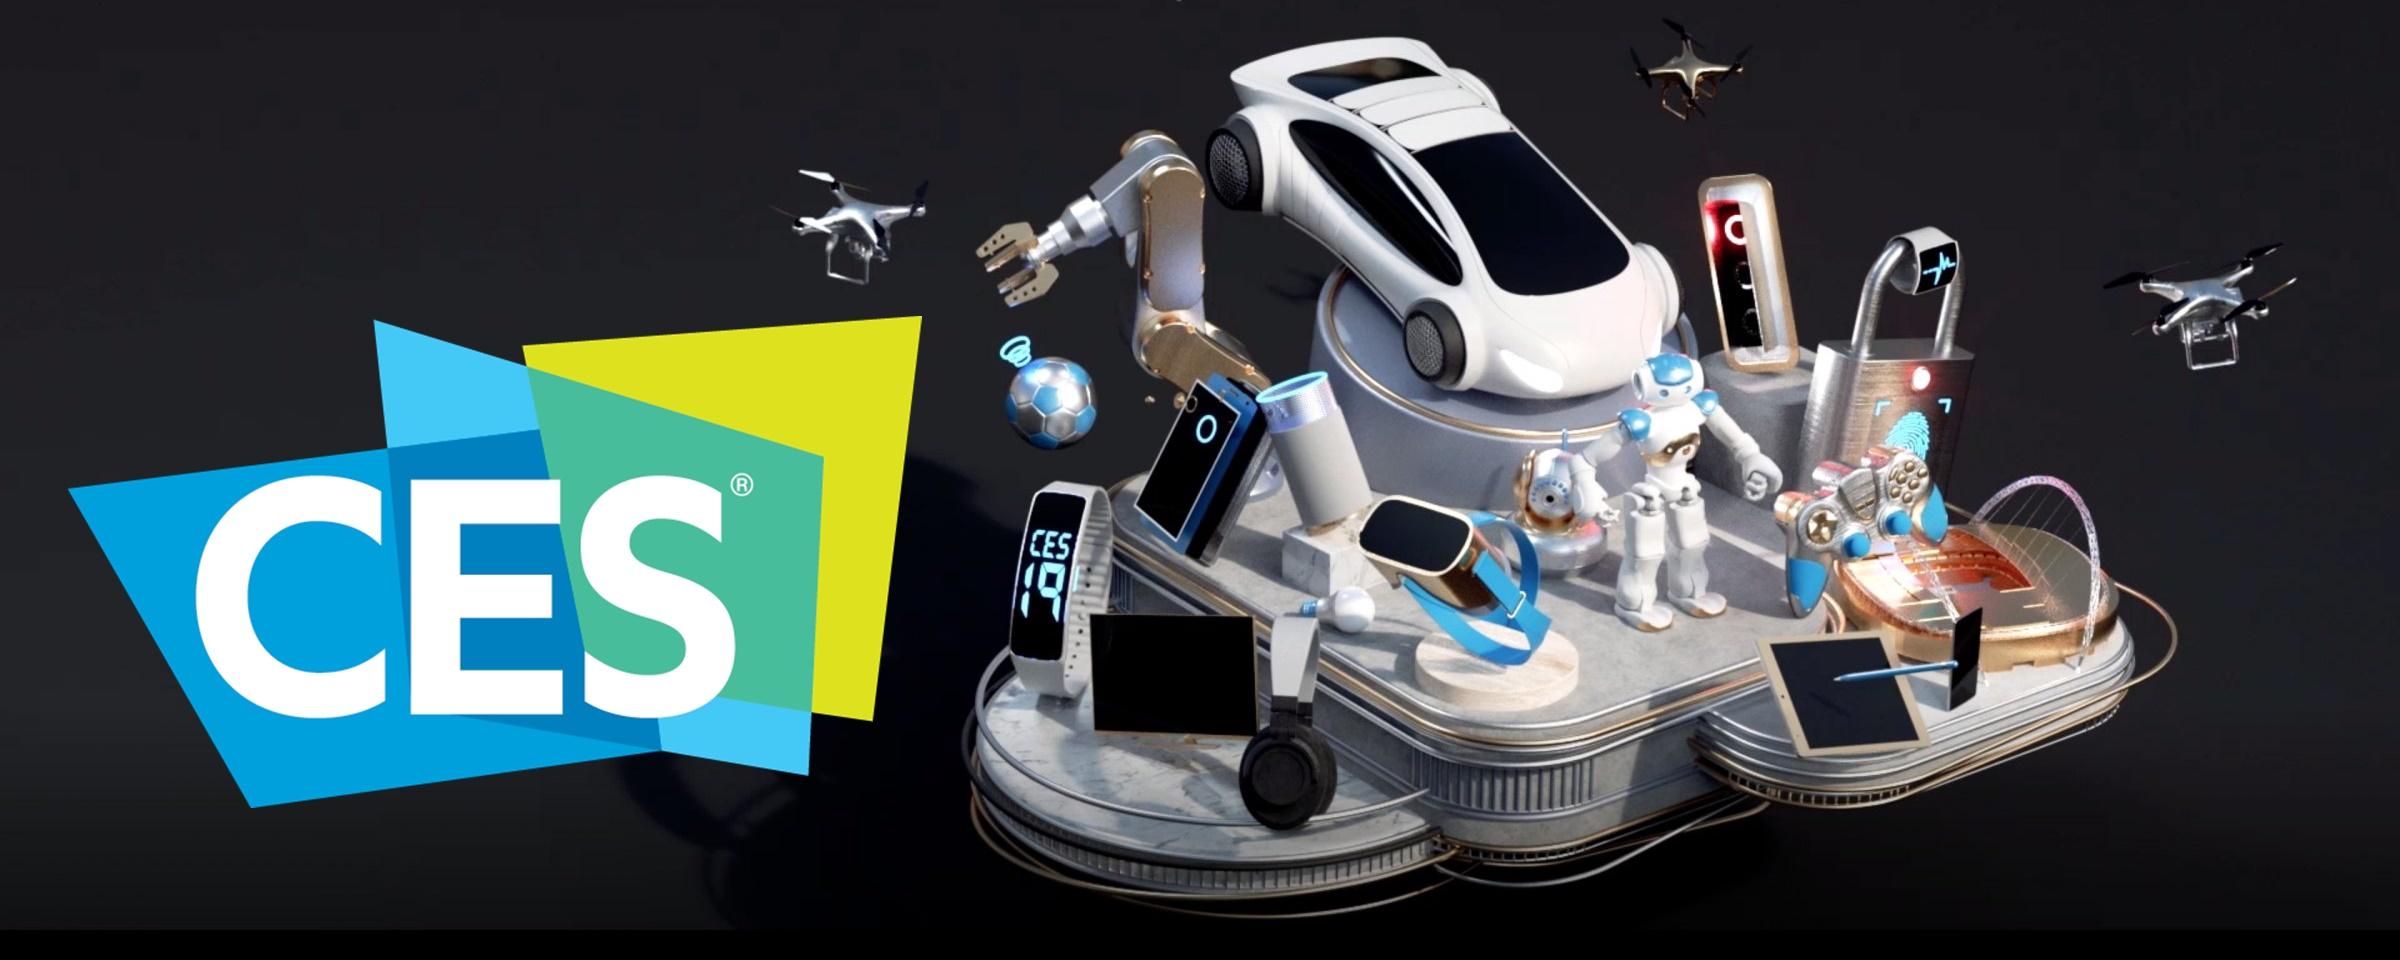 Tem Na Web - Na agenda! LG, Sony e Samsung marcam data para conferências na CES 2019